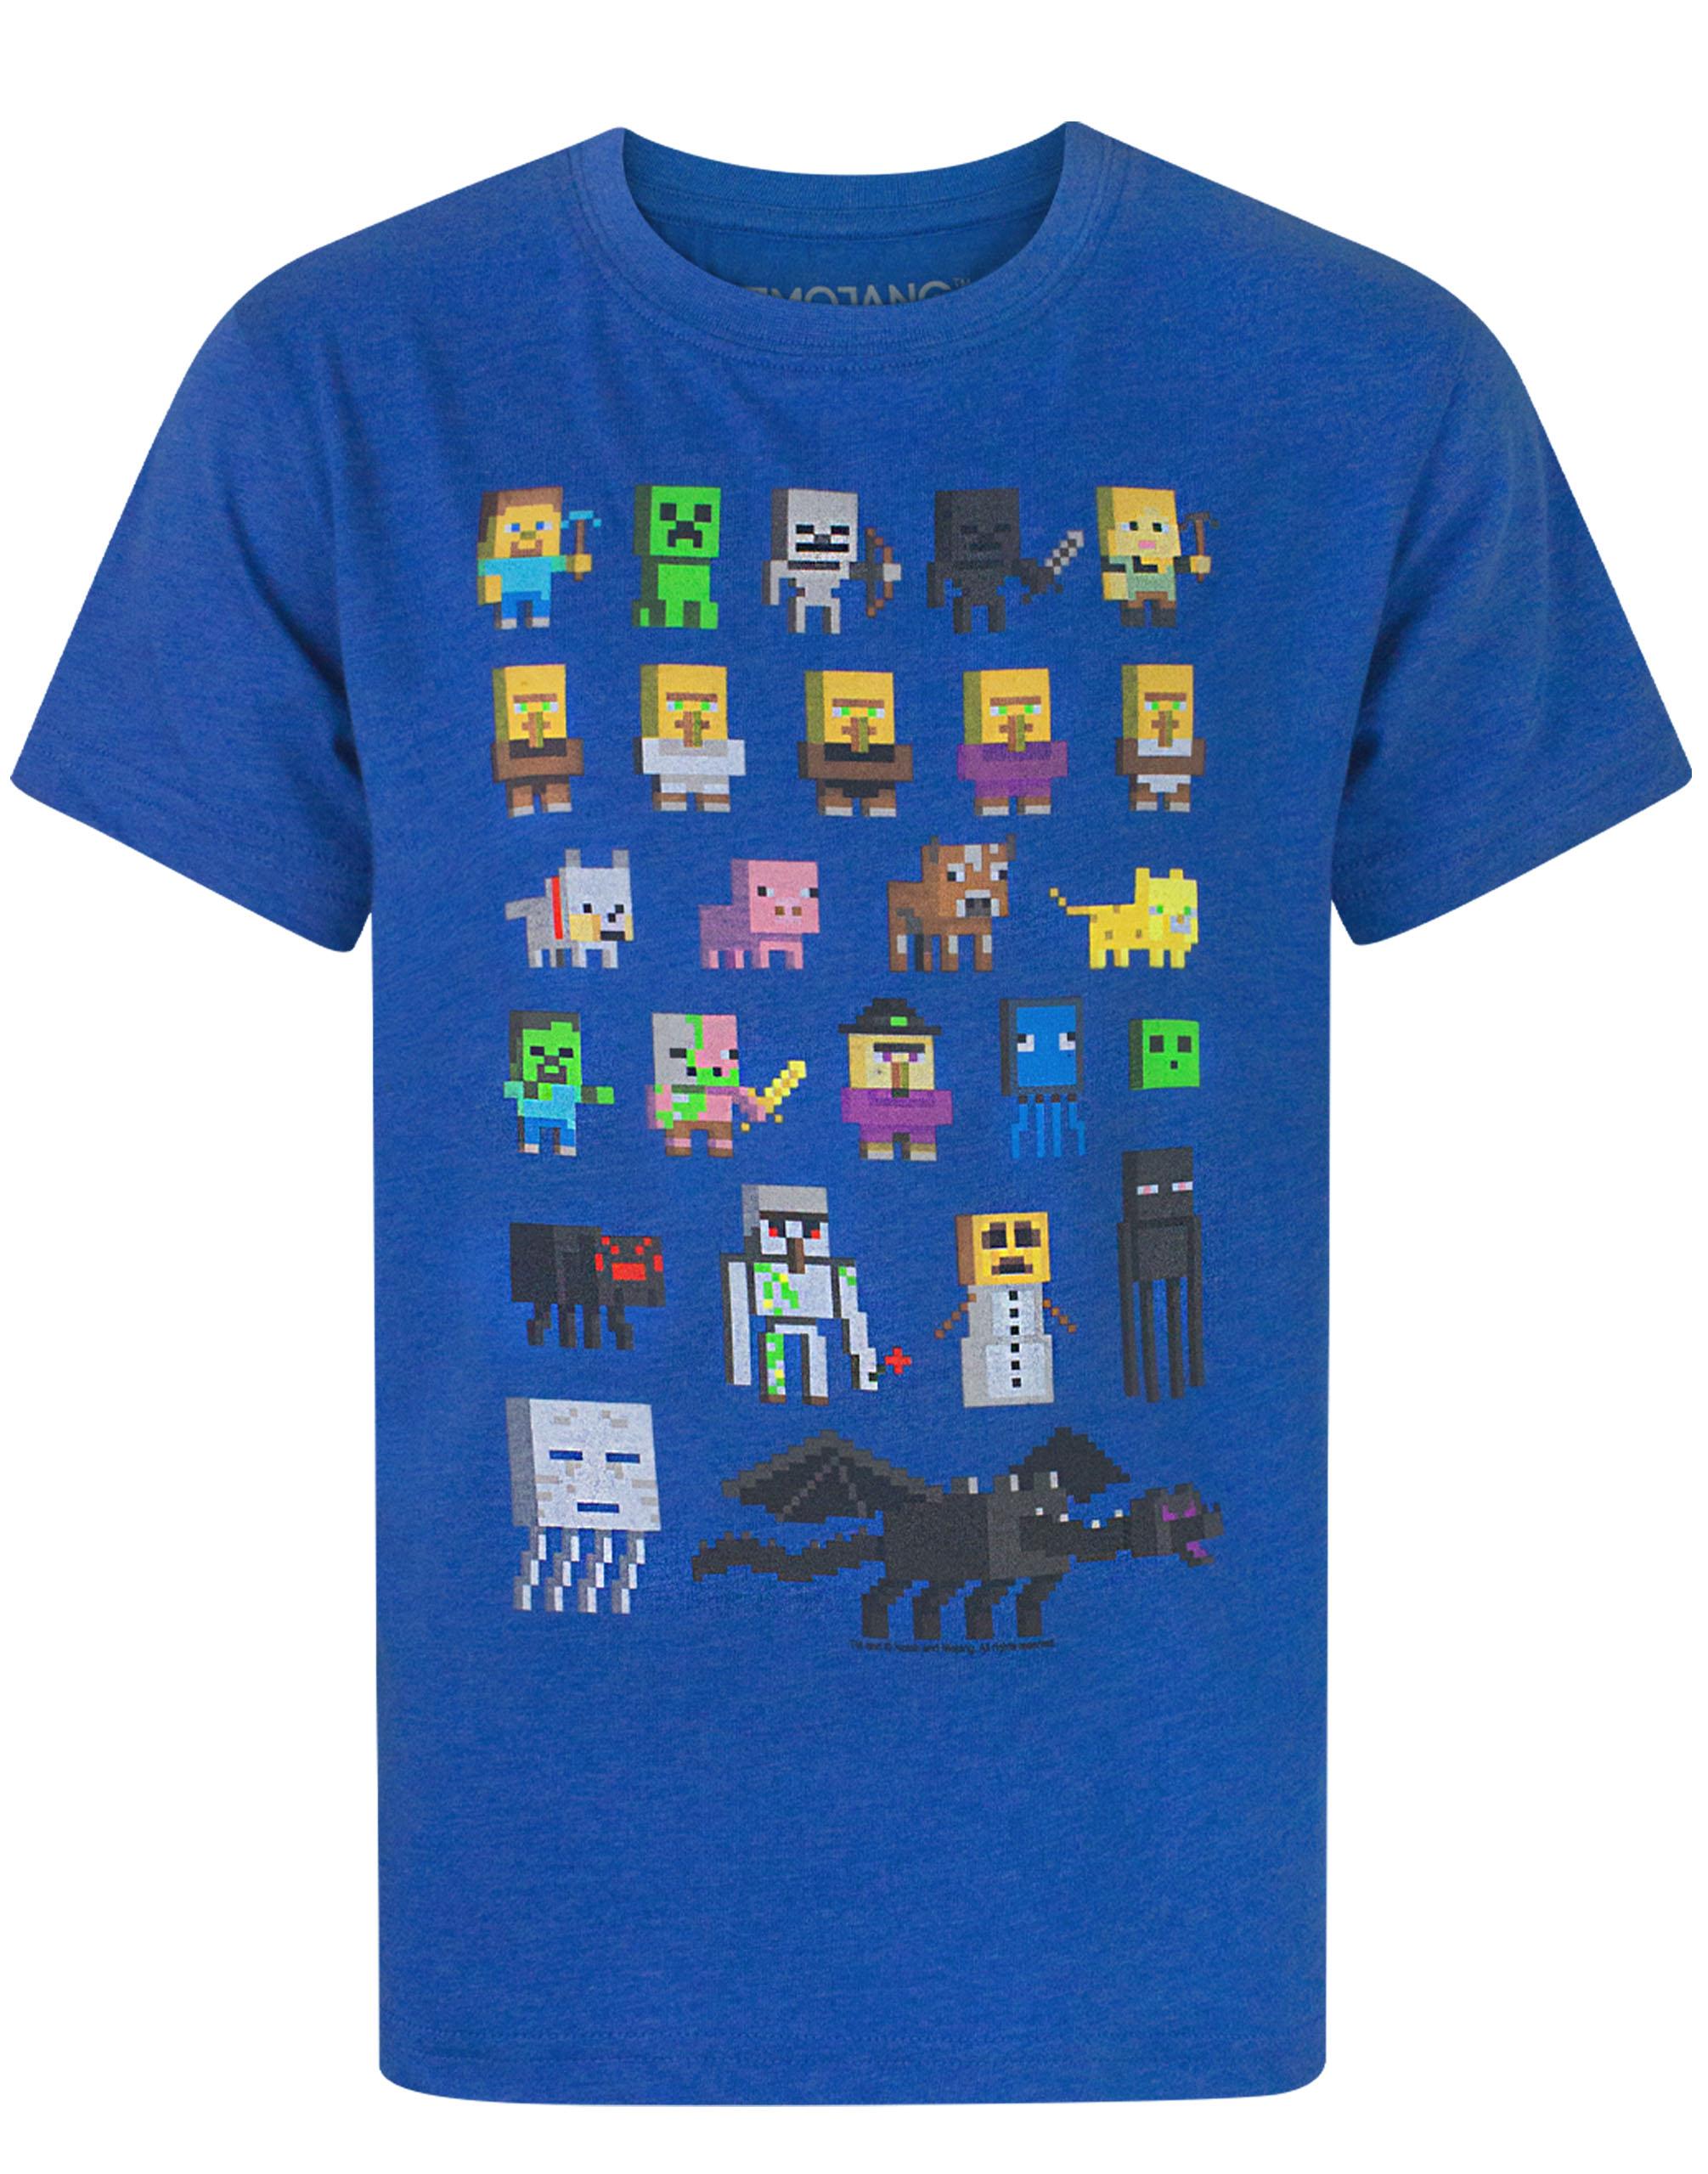 Boys T Shirts Batman Blue Black Character Spring Summer Wear Size 2 3 4 5 6 7 8